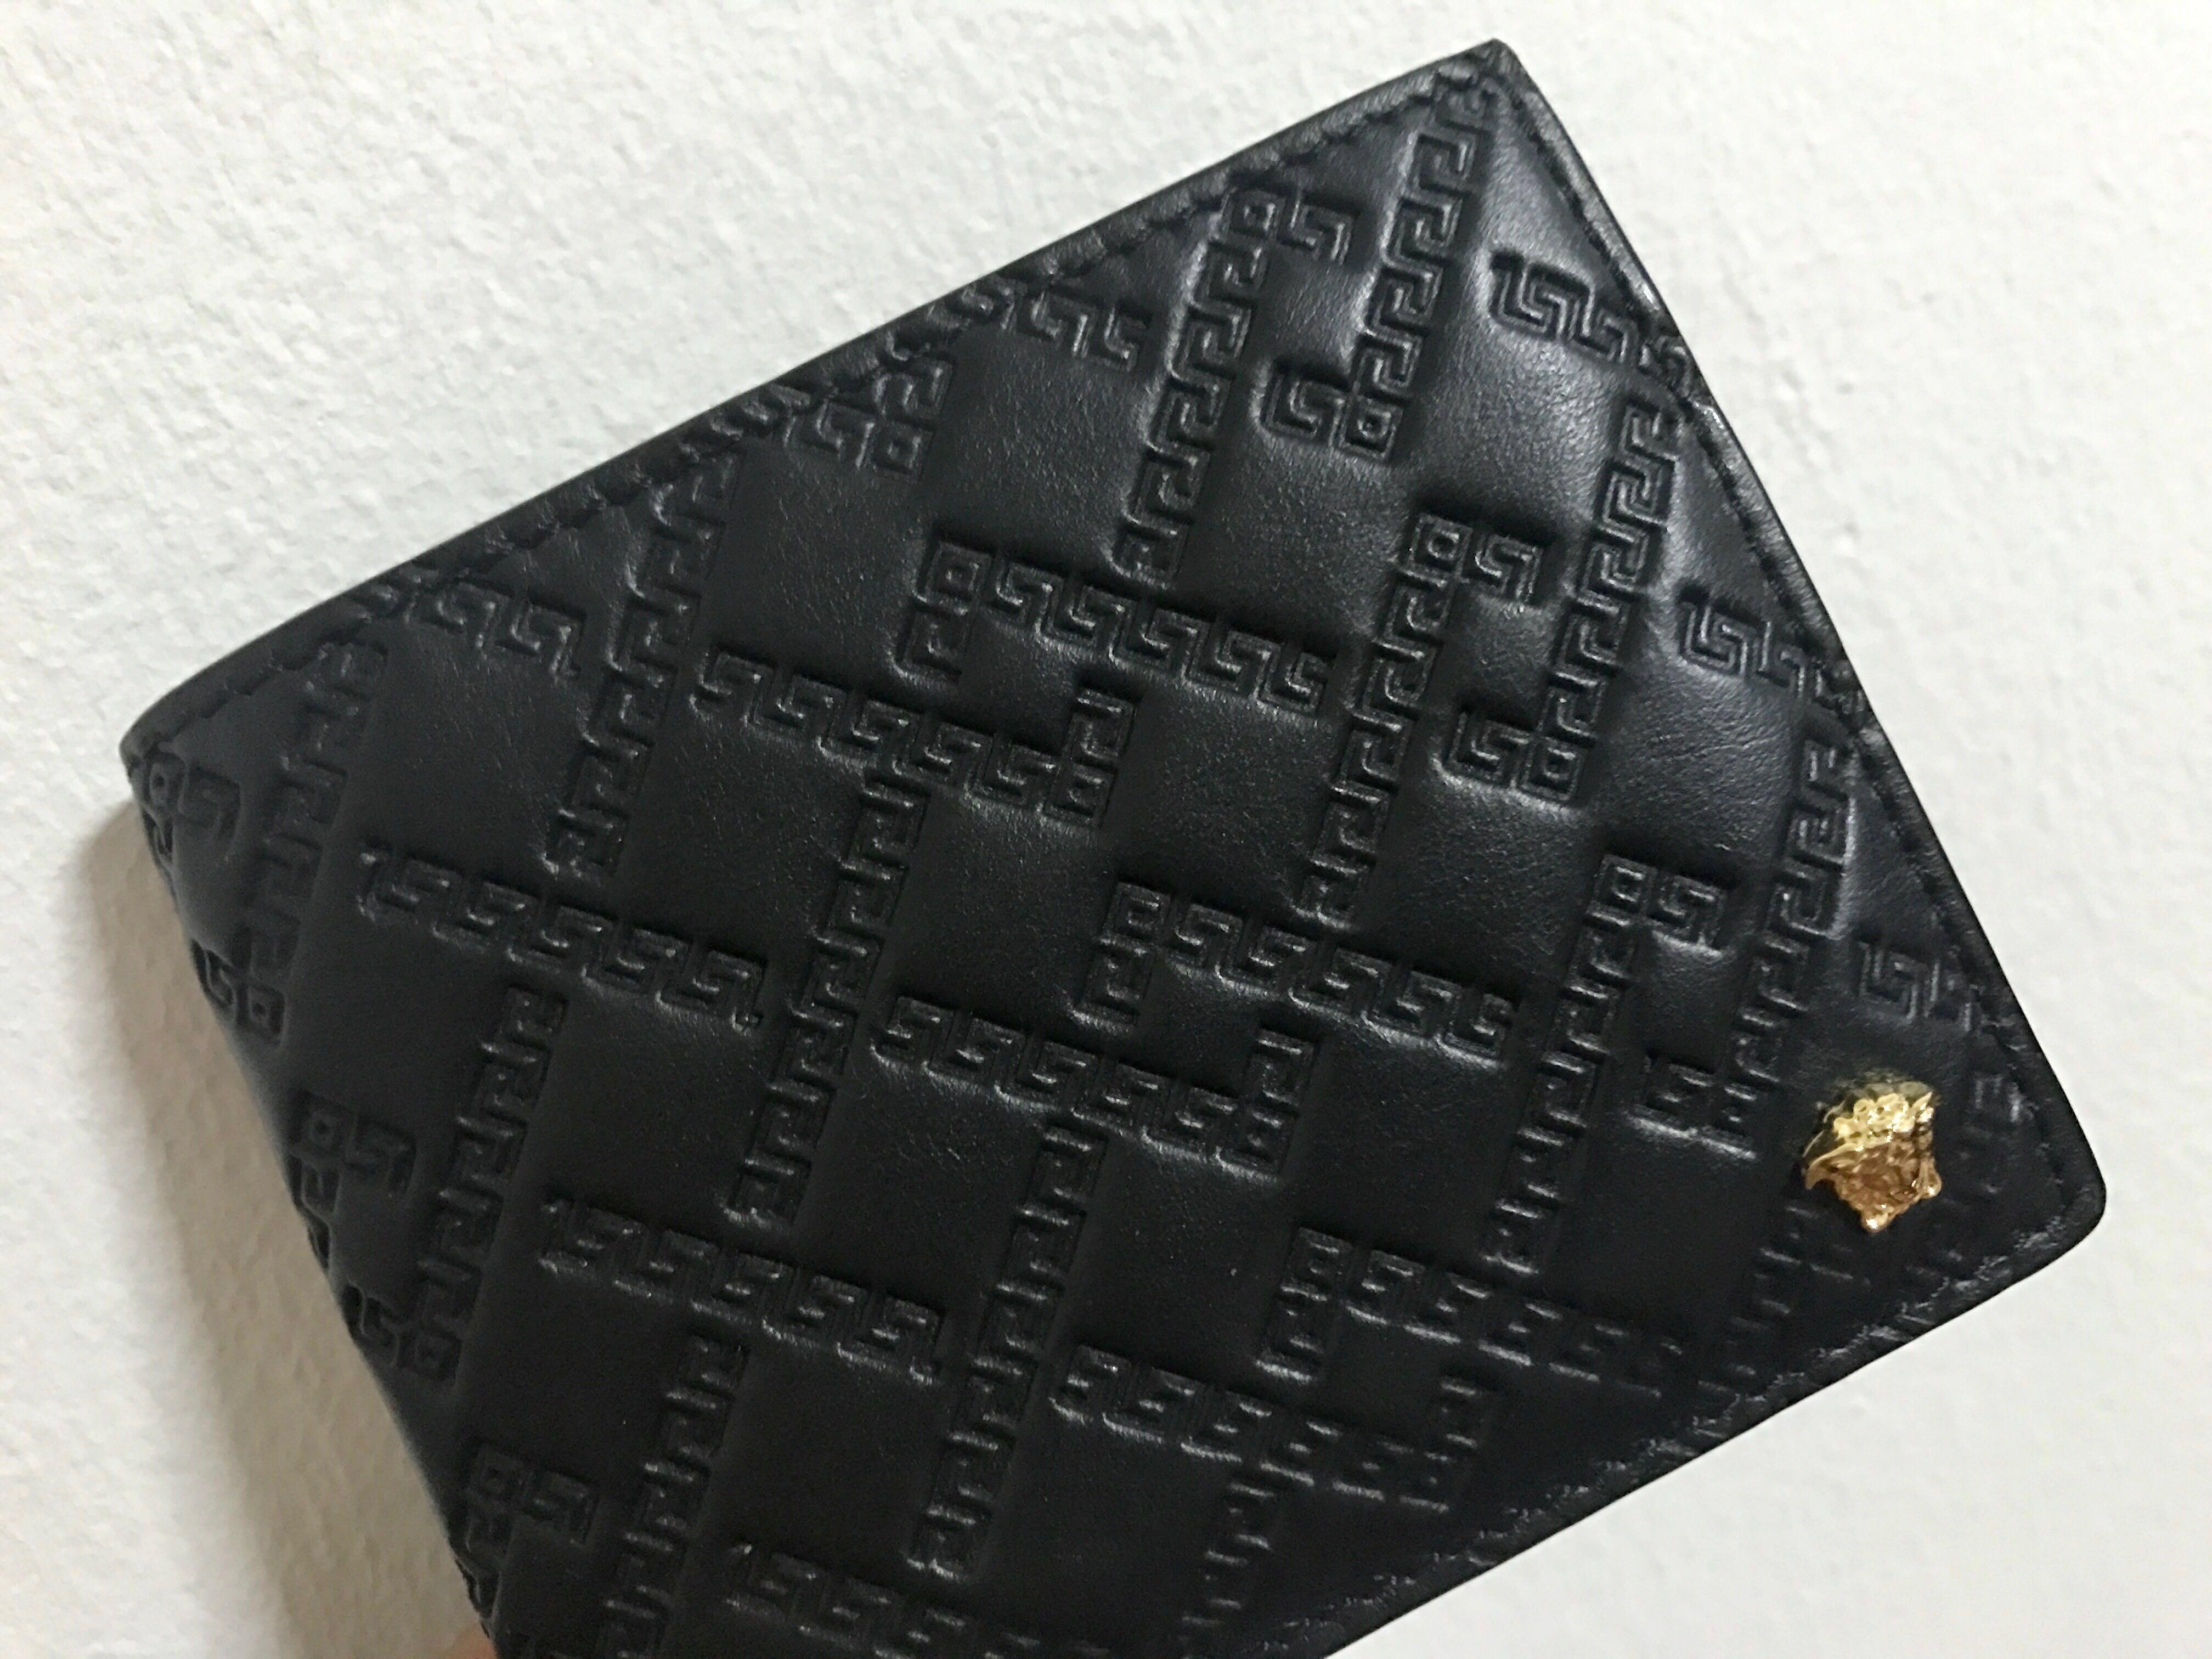 1f3b1544c5a Versace Greca Argyle Medusa Wallet, Luxury, Bags & Wallets, Wallets ...